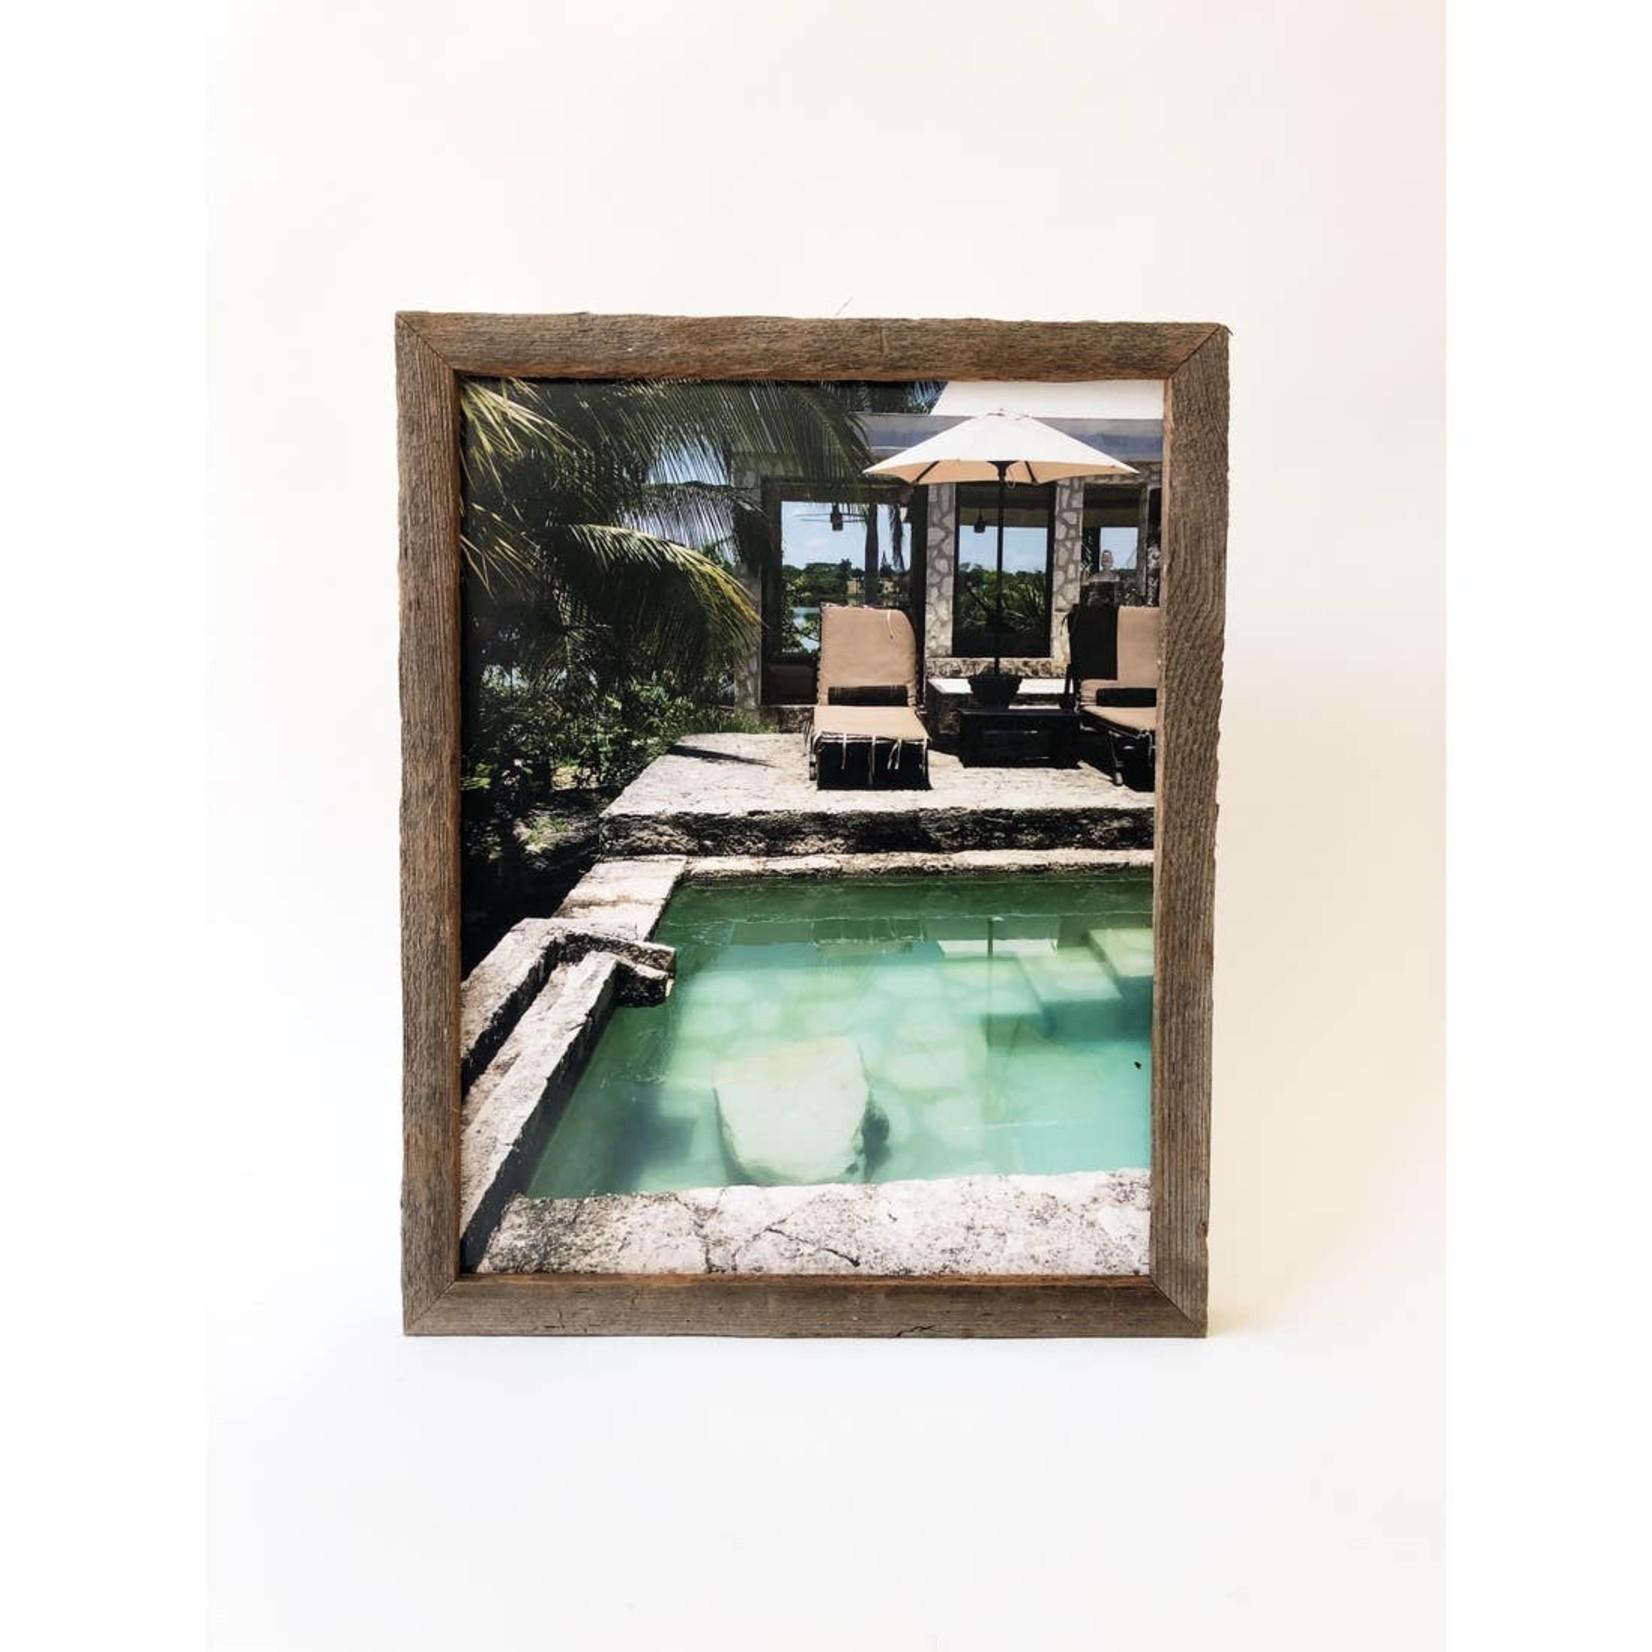 Alibi Interiors Alibi Reclaimed Wood Gallery Frame 11x14